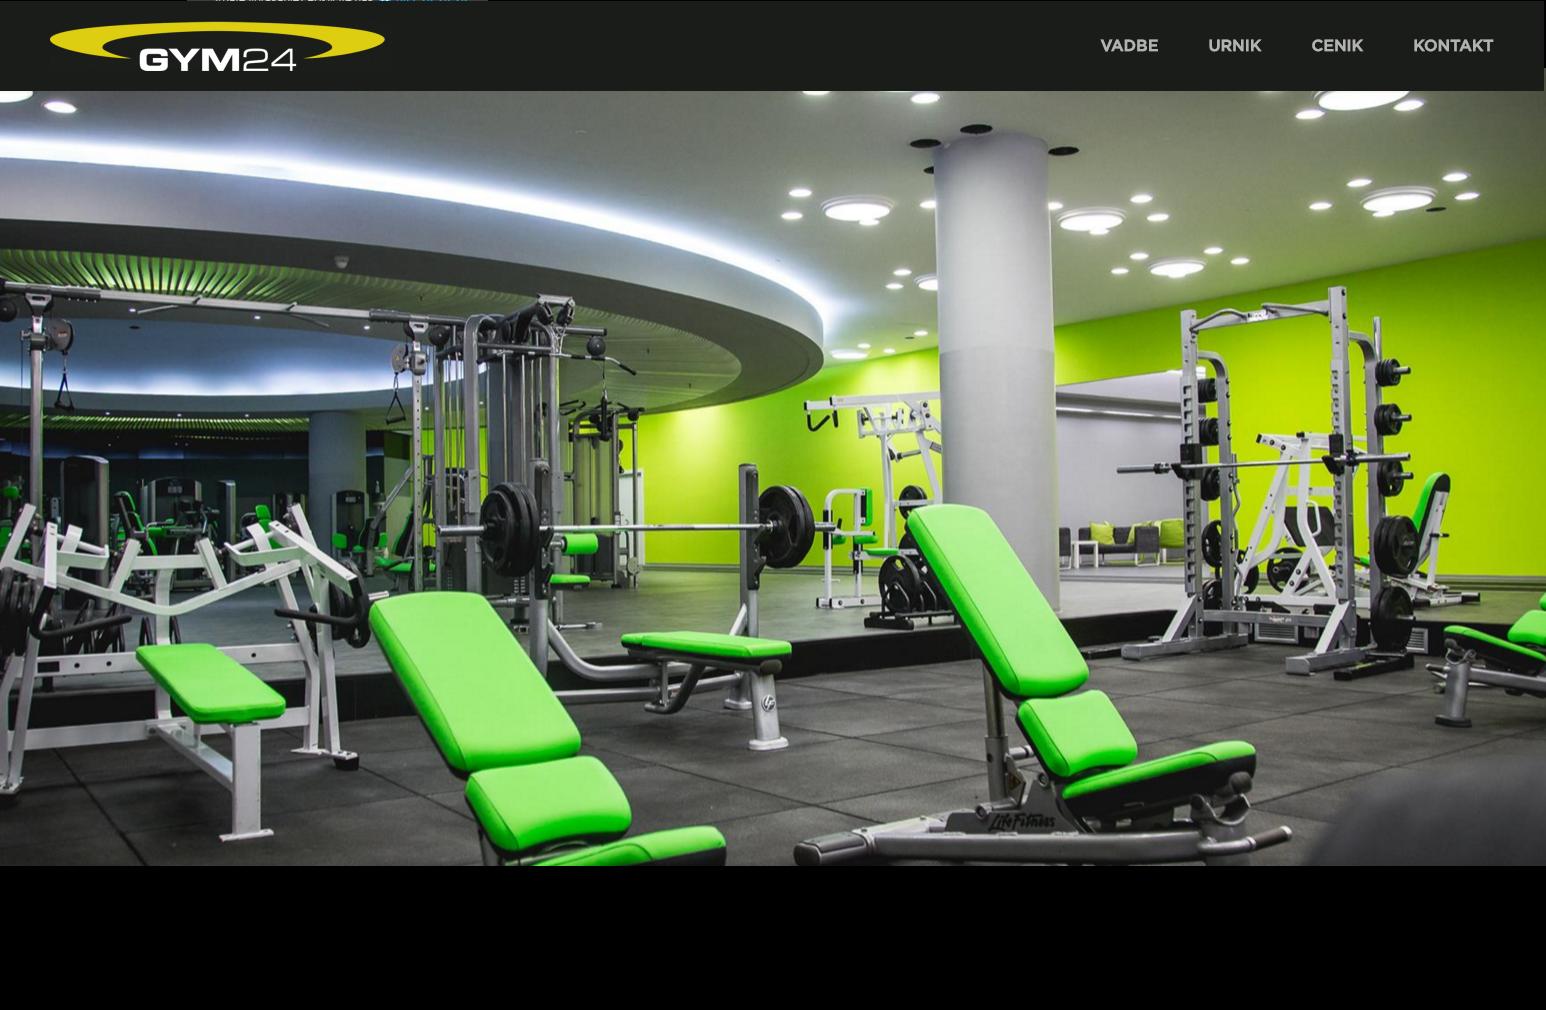 Gym24 stran